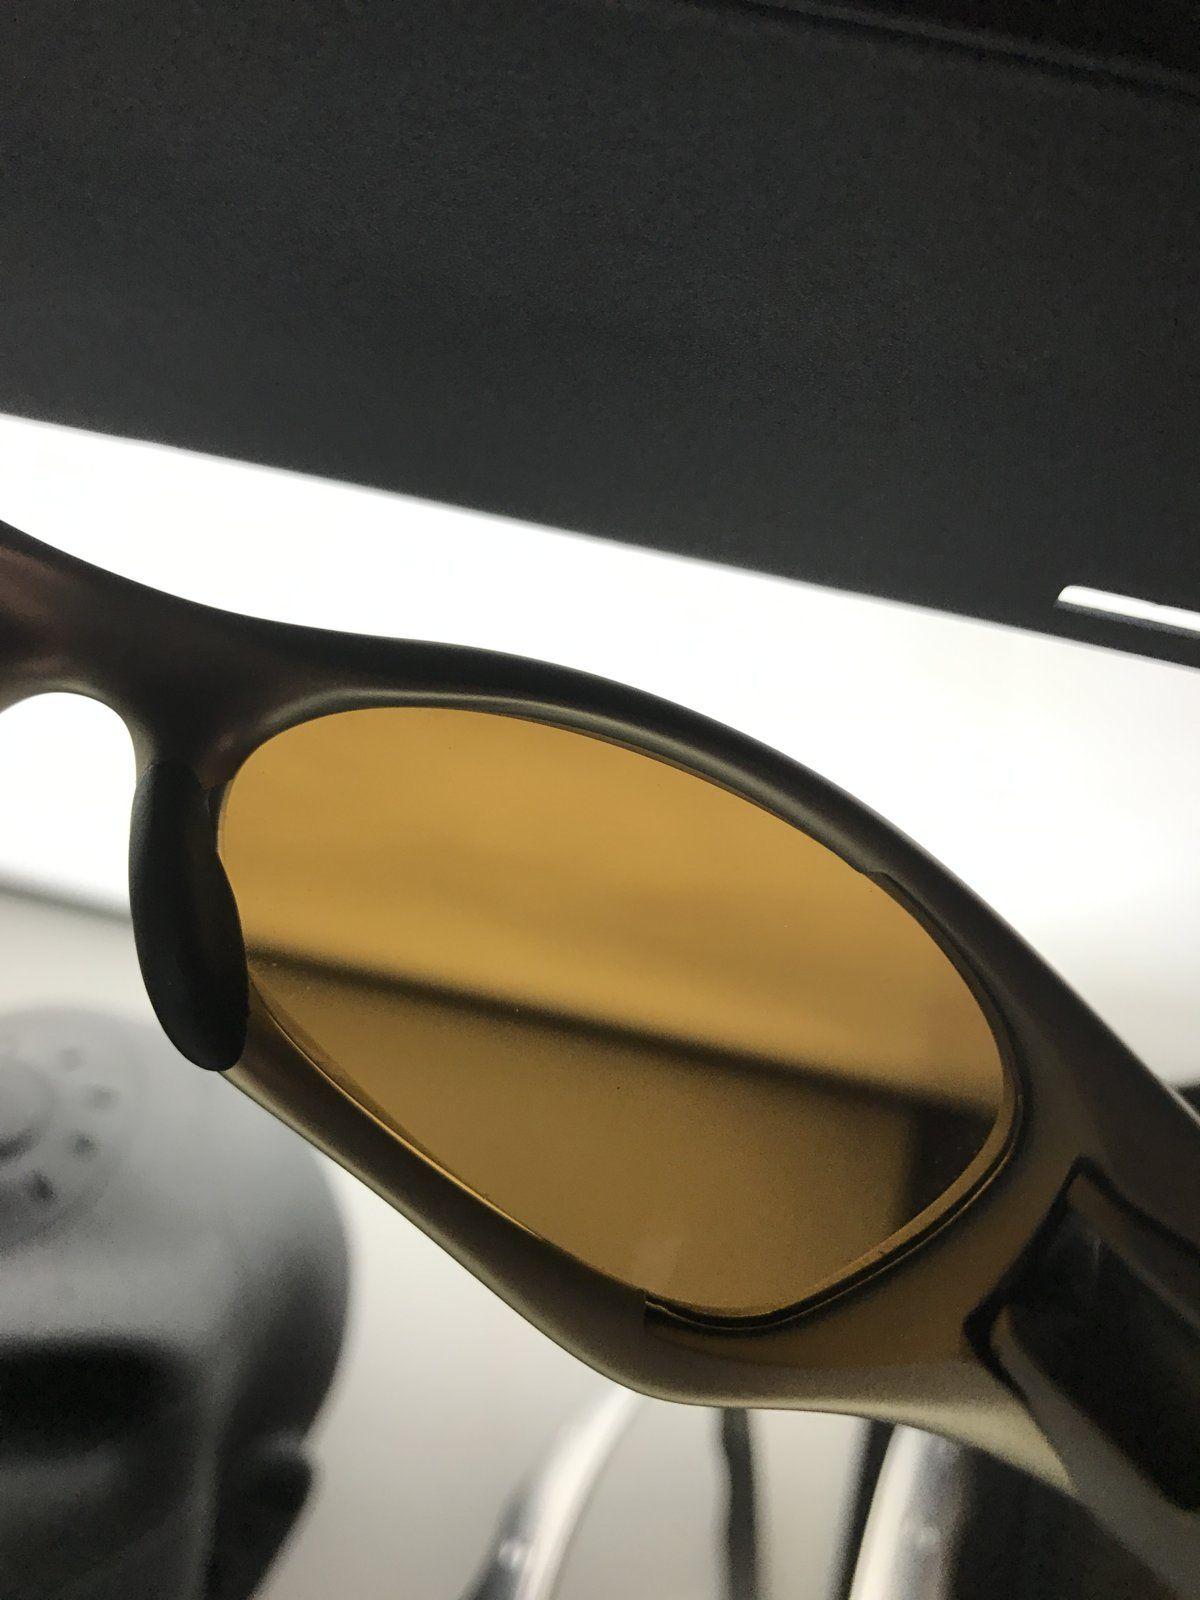 Valve FMJ Platinum - FMJ+ w/ gold iridium - $110 - IMG_6356.JPG